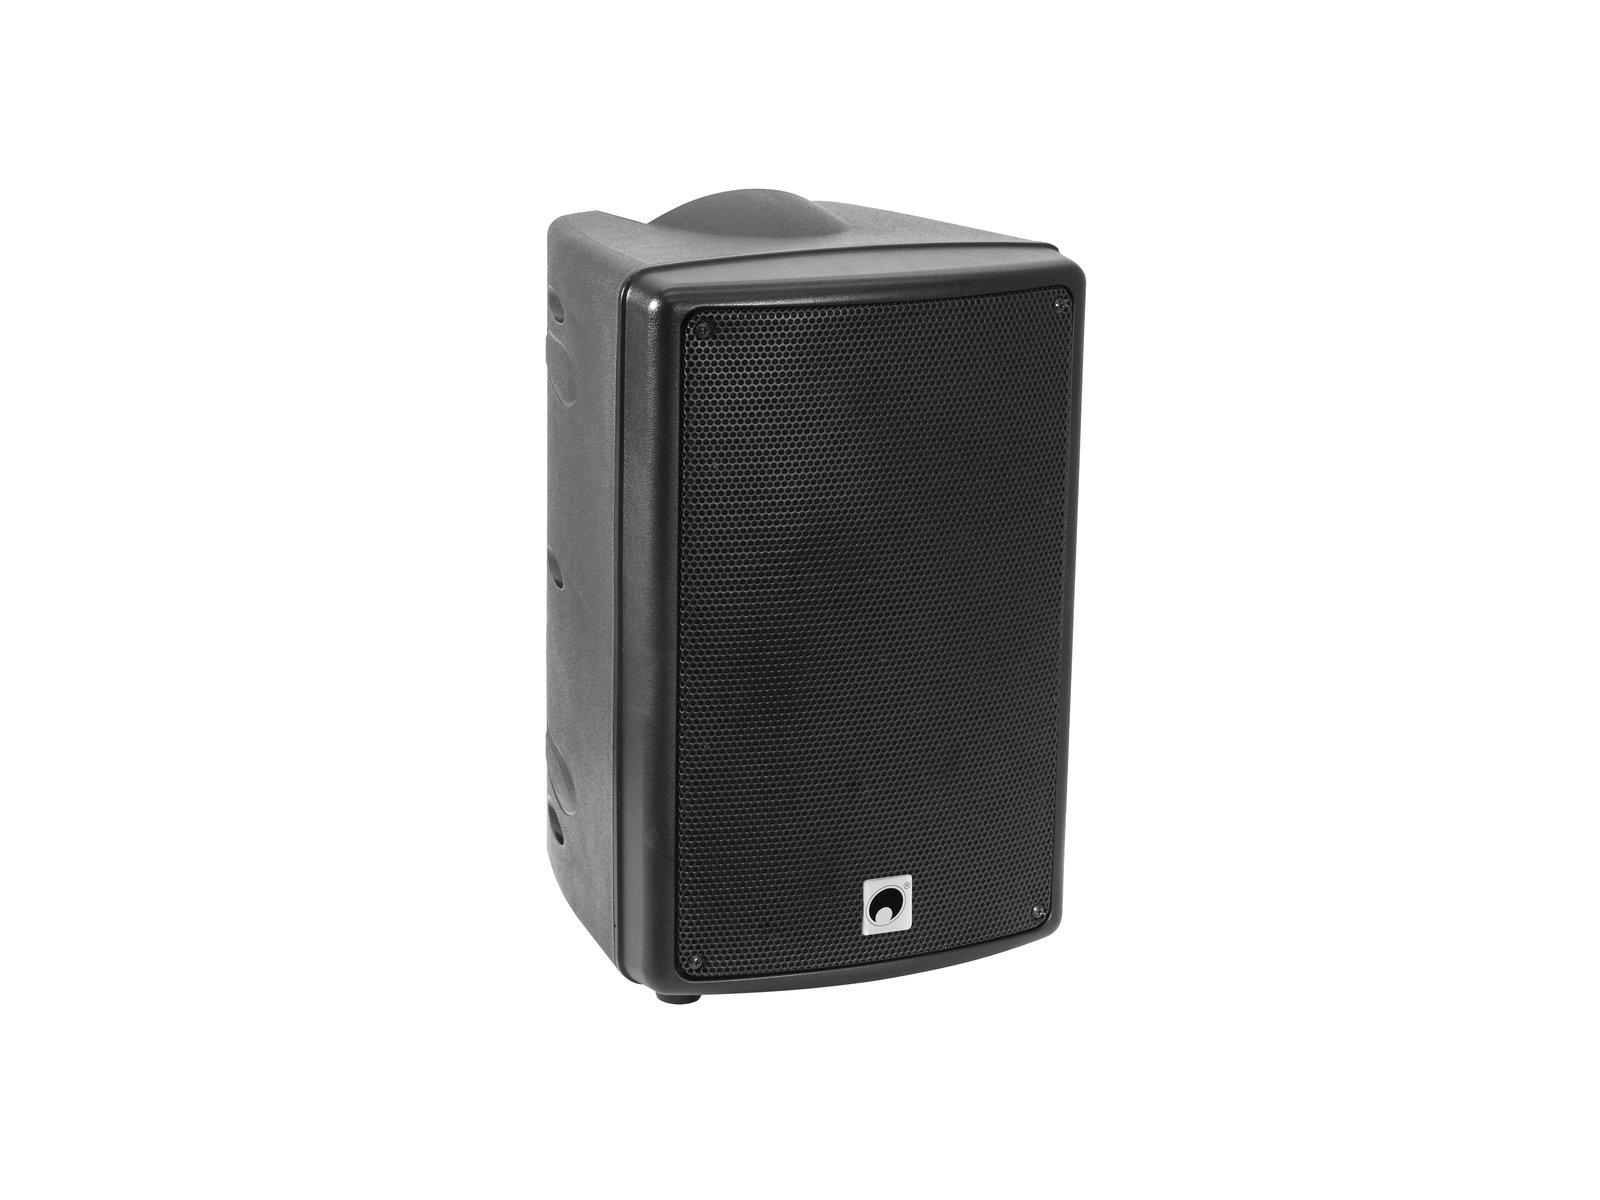 Omnitronic WAMS 08BT MK 2 Akku PA System